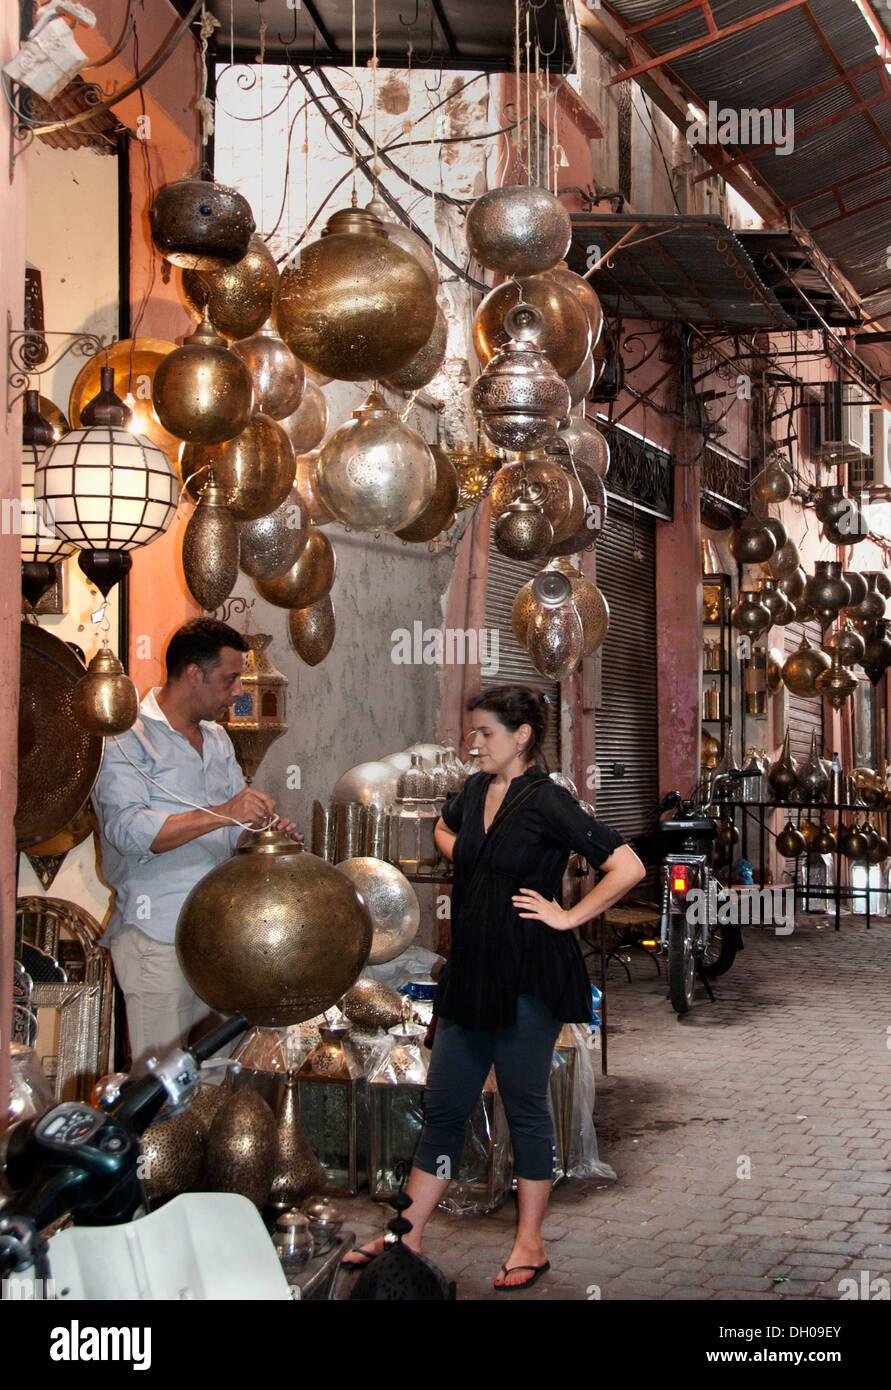 Lampes antiques Shop Maroc Marrakech Medina Souk Photo Stock